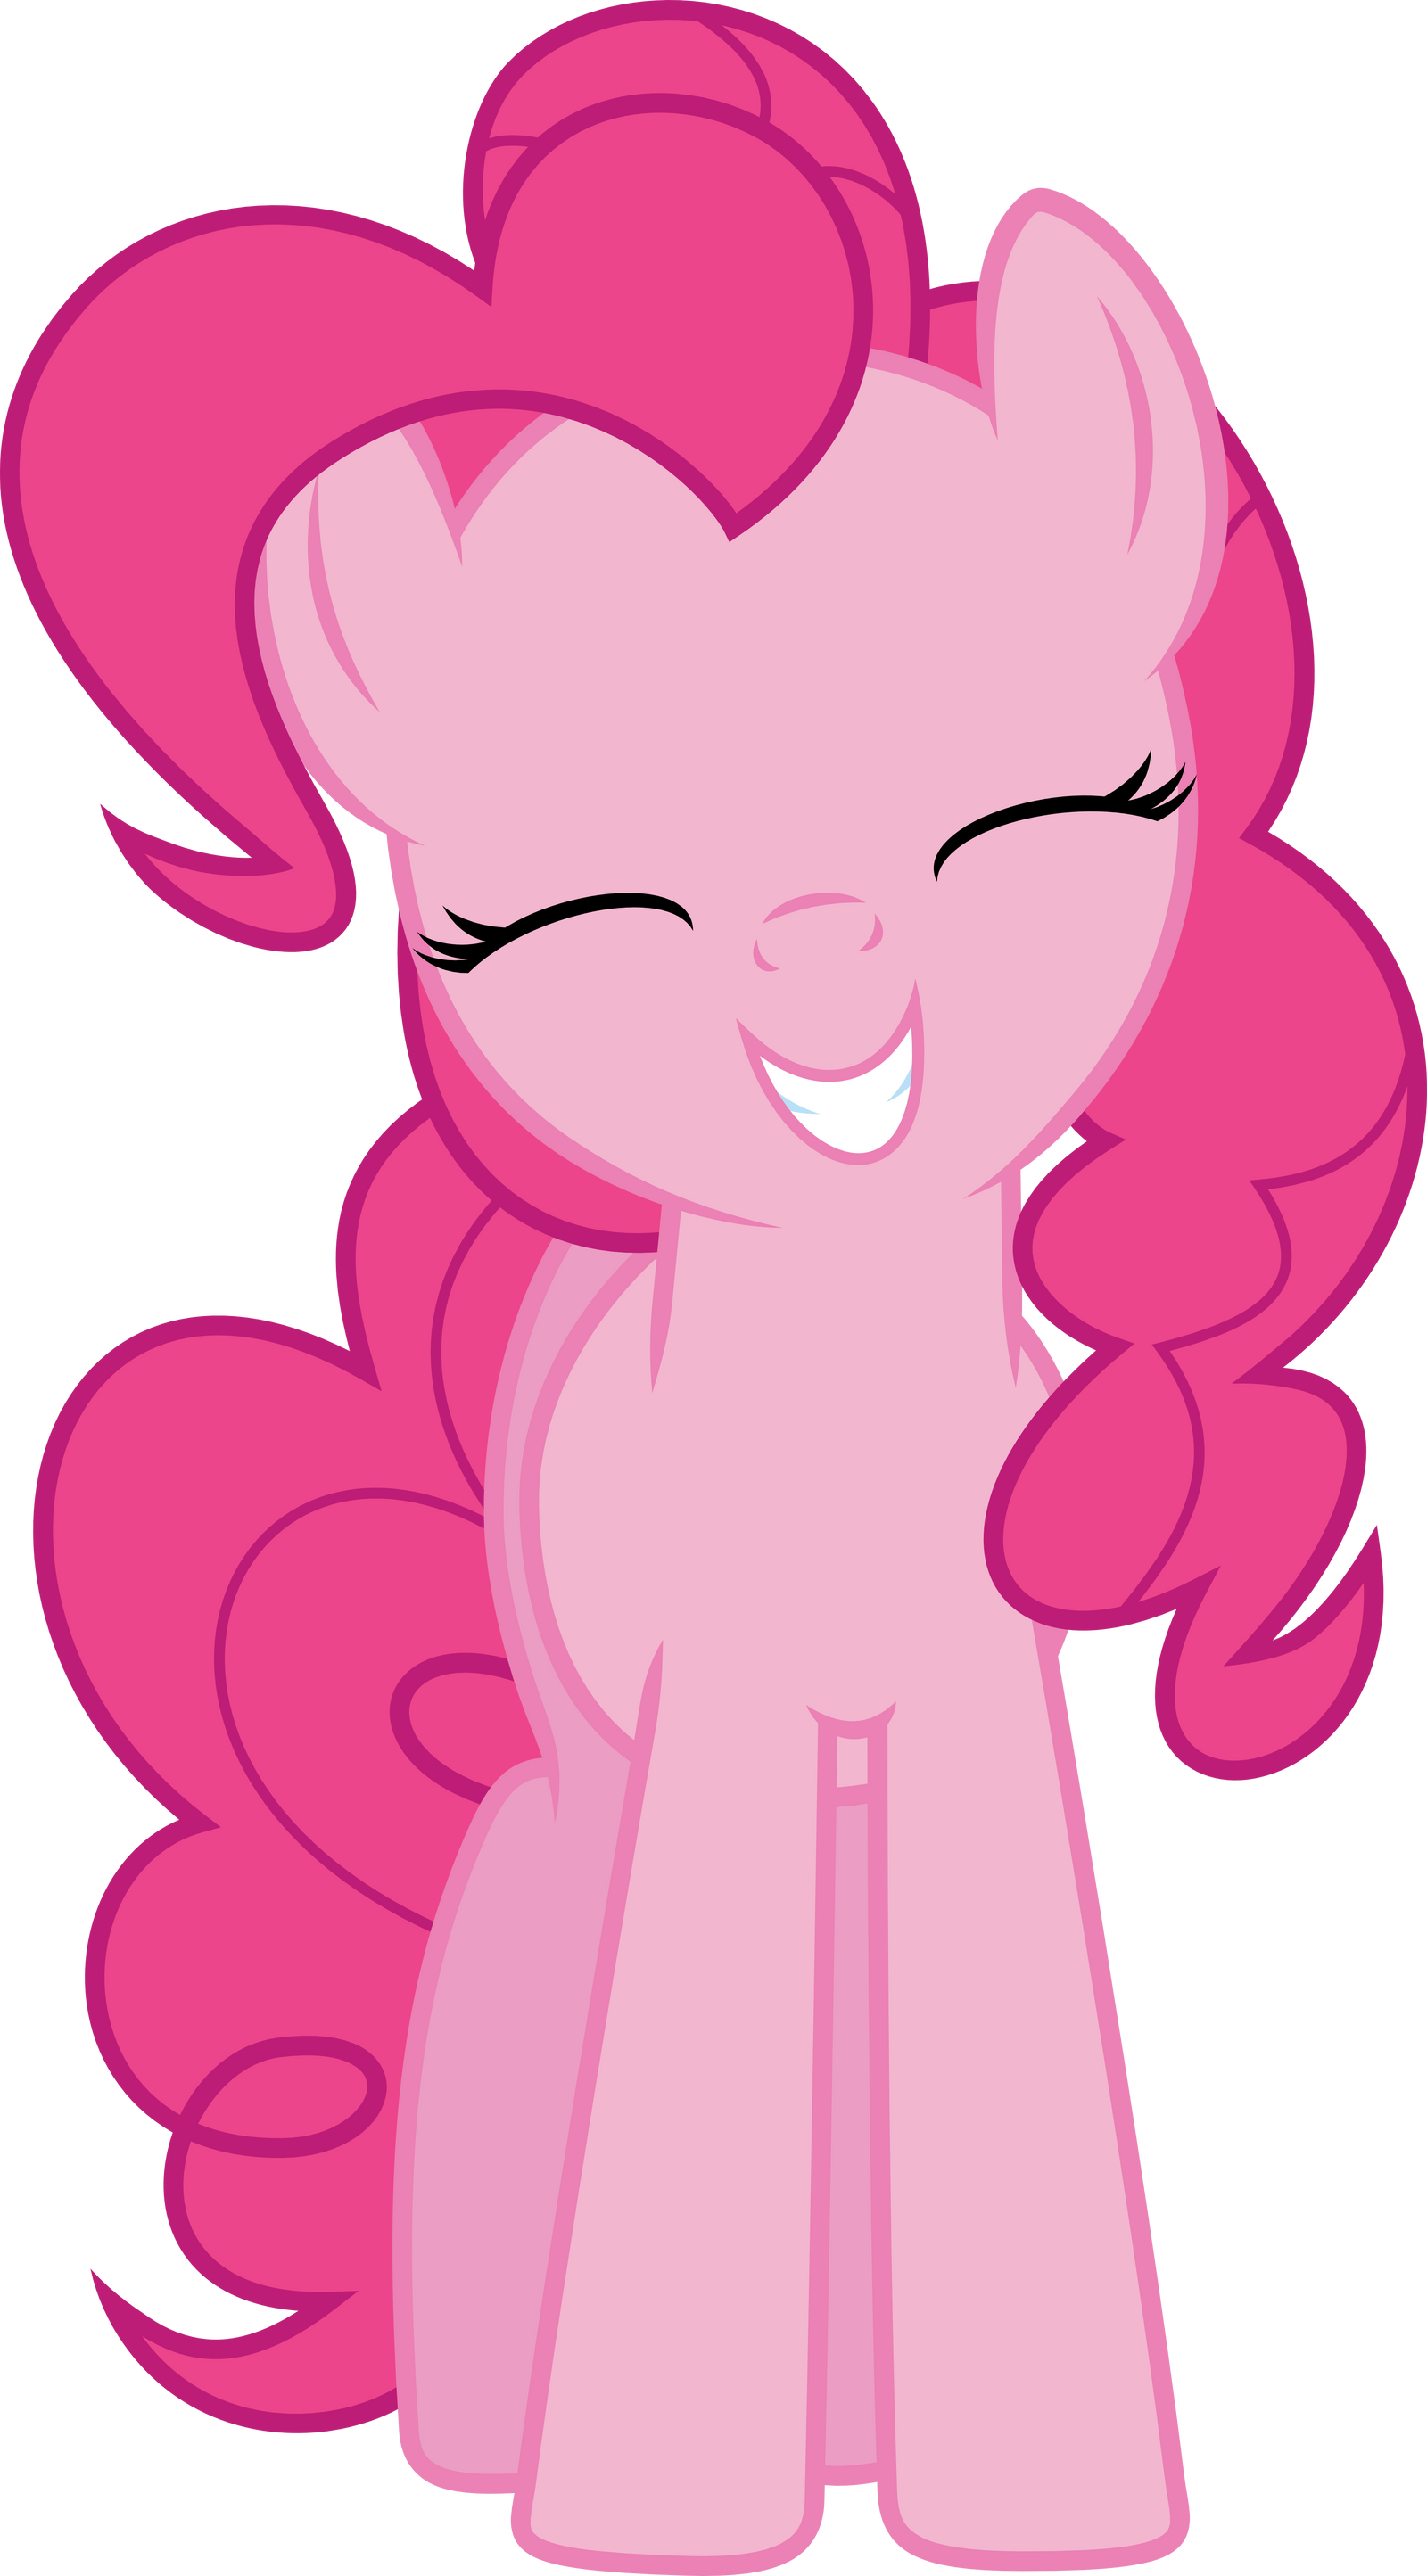 Feel good Pinkie Pie blog - Fimfiction